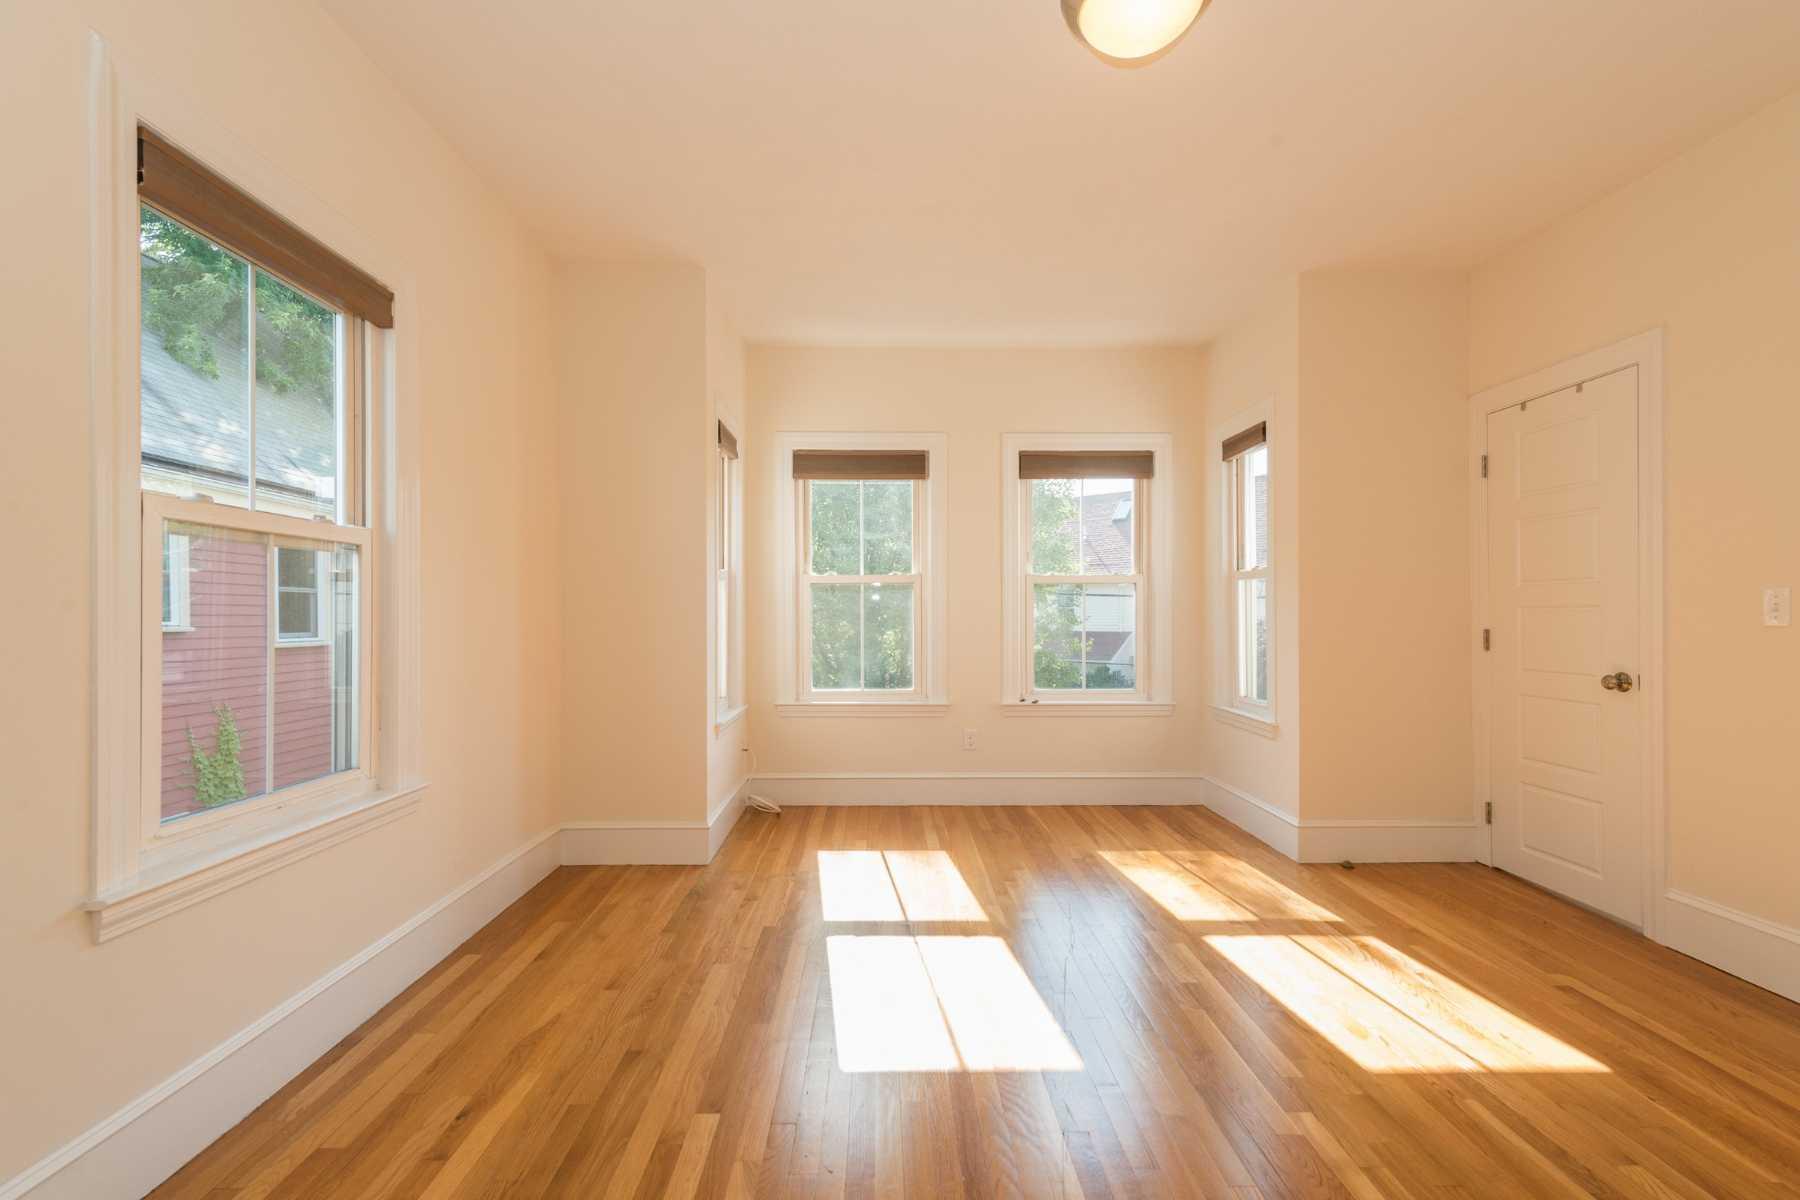 8-CapstoneCommunities-property-Dickinson-Street-Apartments-Somerville.jpg